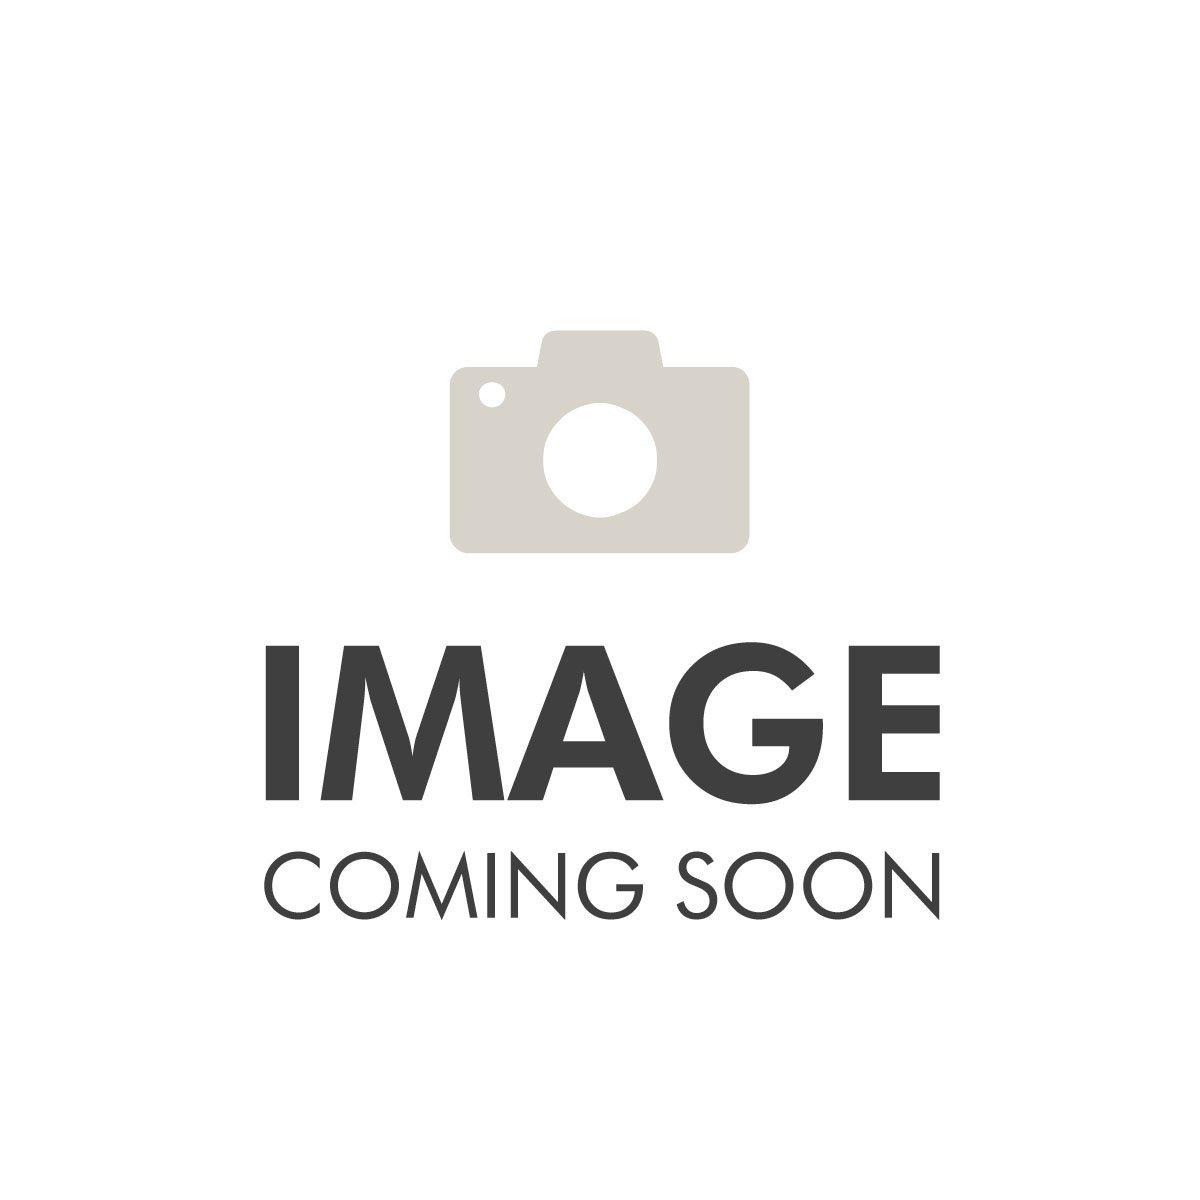 Shiseido Stick Foundation SPF15 10g Natural Fair Ivory i40